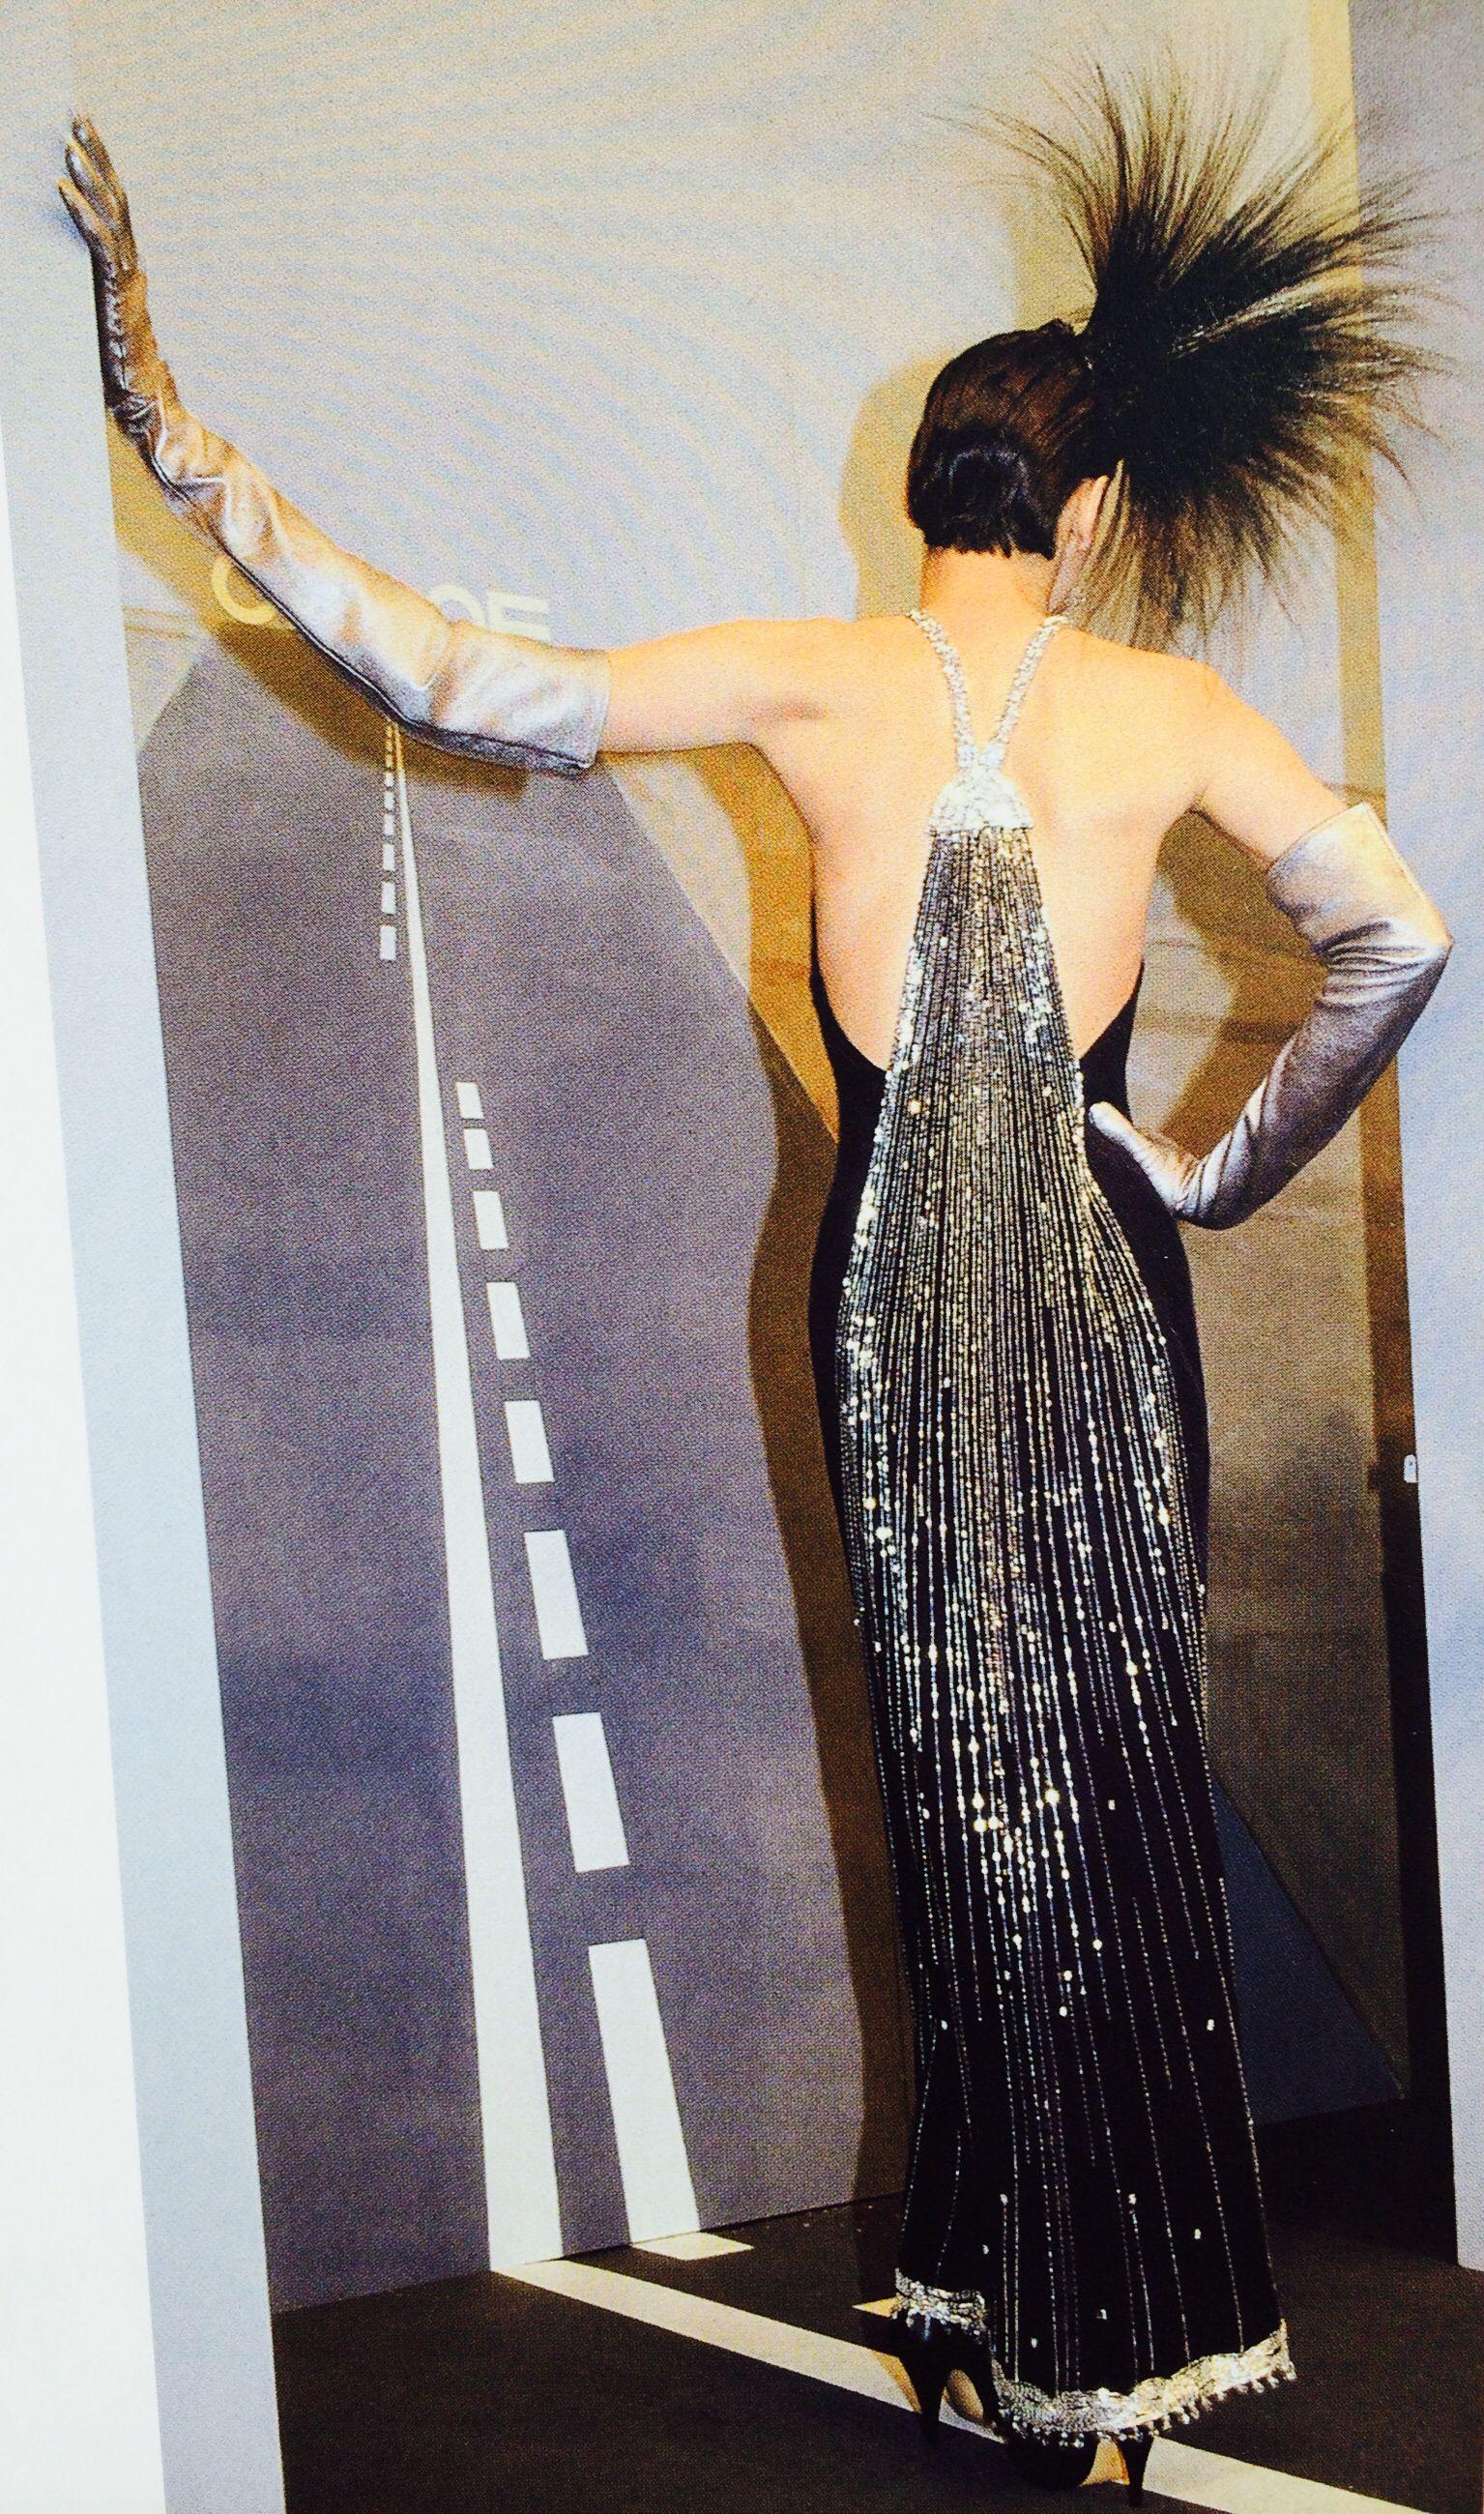 Karl Lagerfeld For Chloe Shower Dress And Silver Gloves